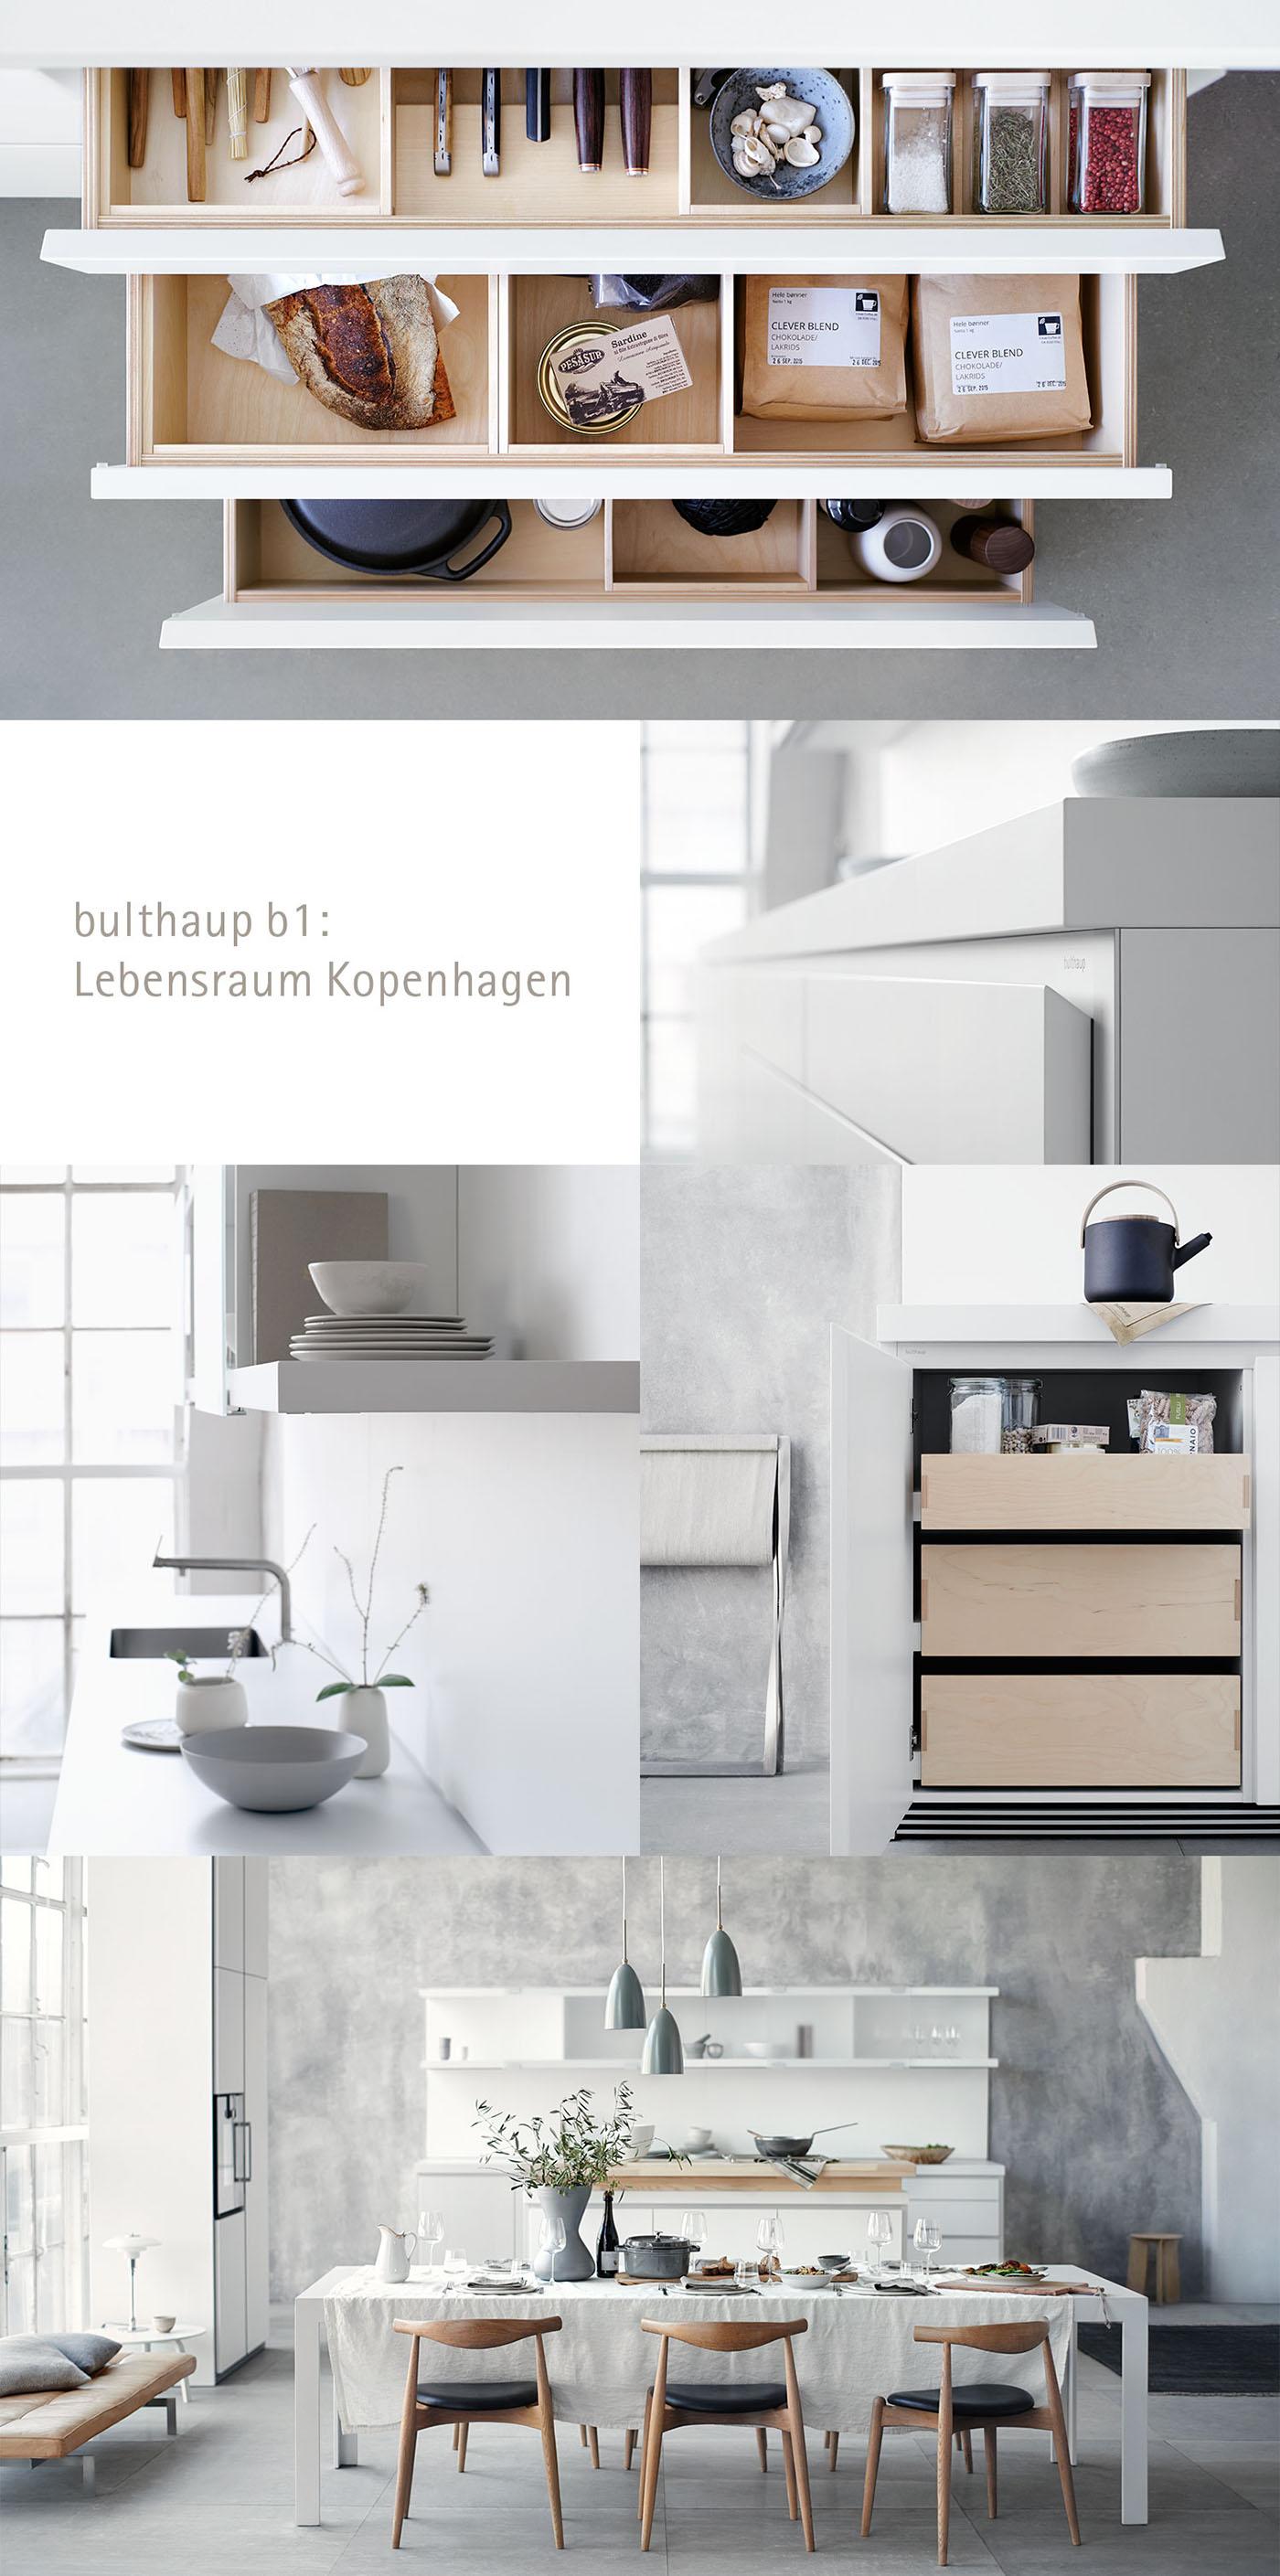 bulthaup b1 Lebensraum Kopenhagen on Behance